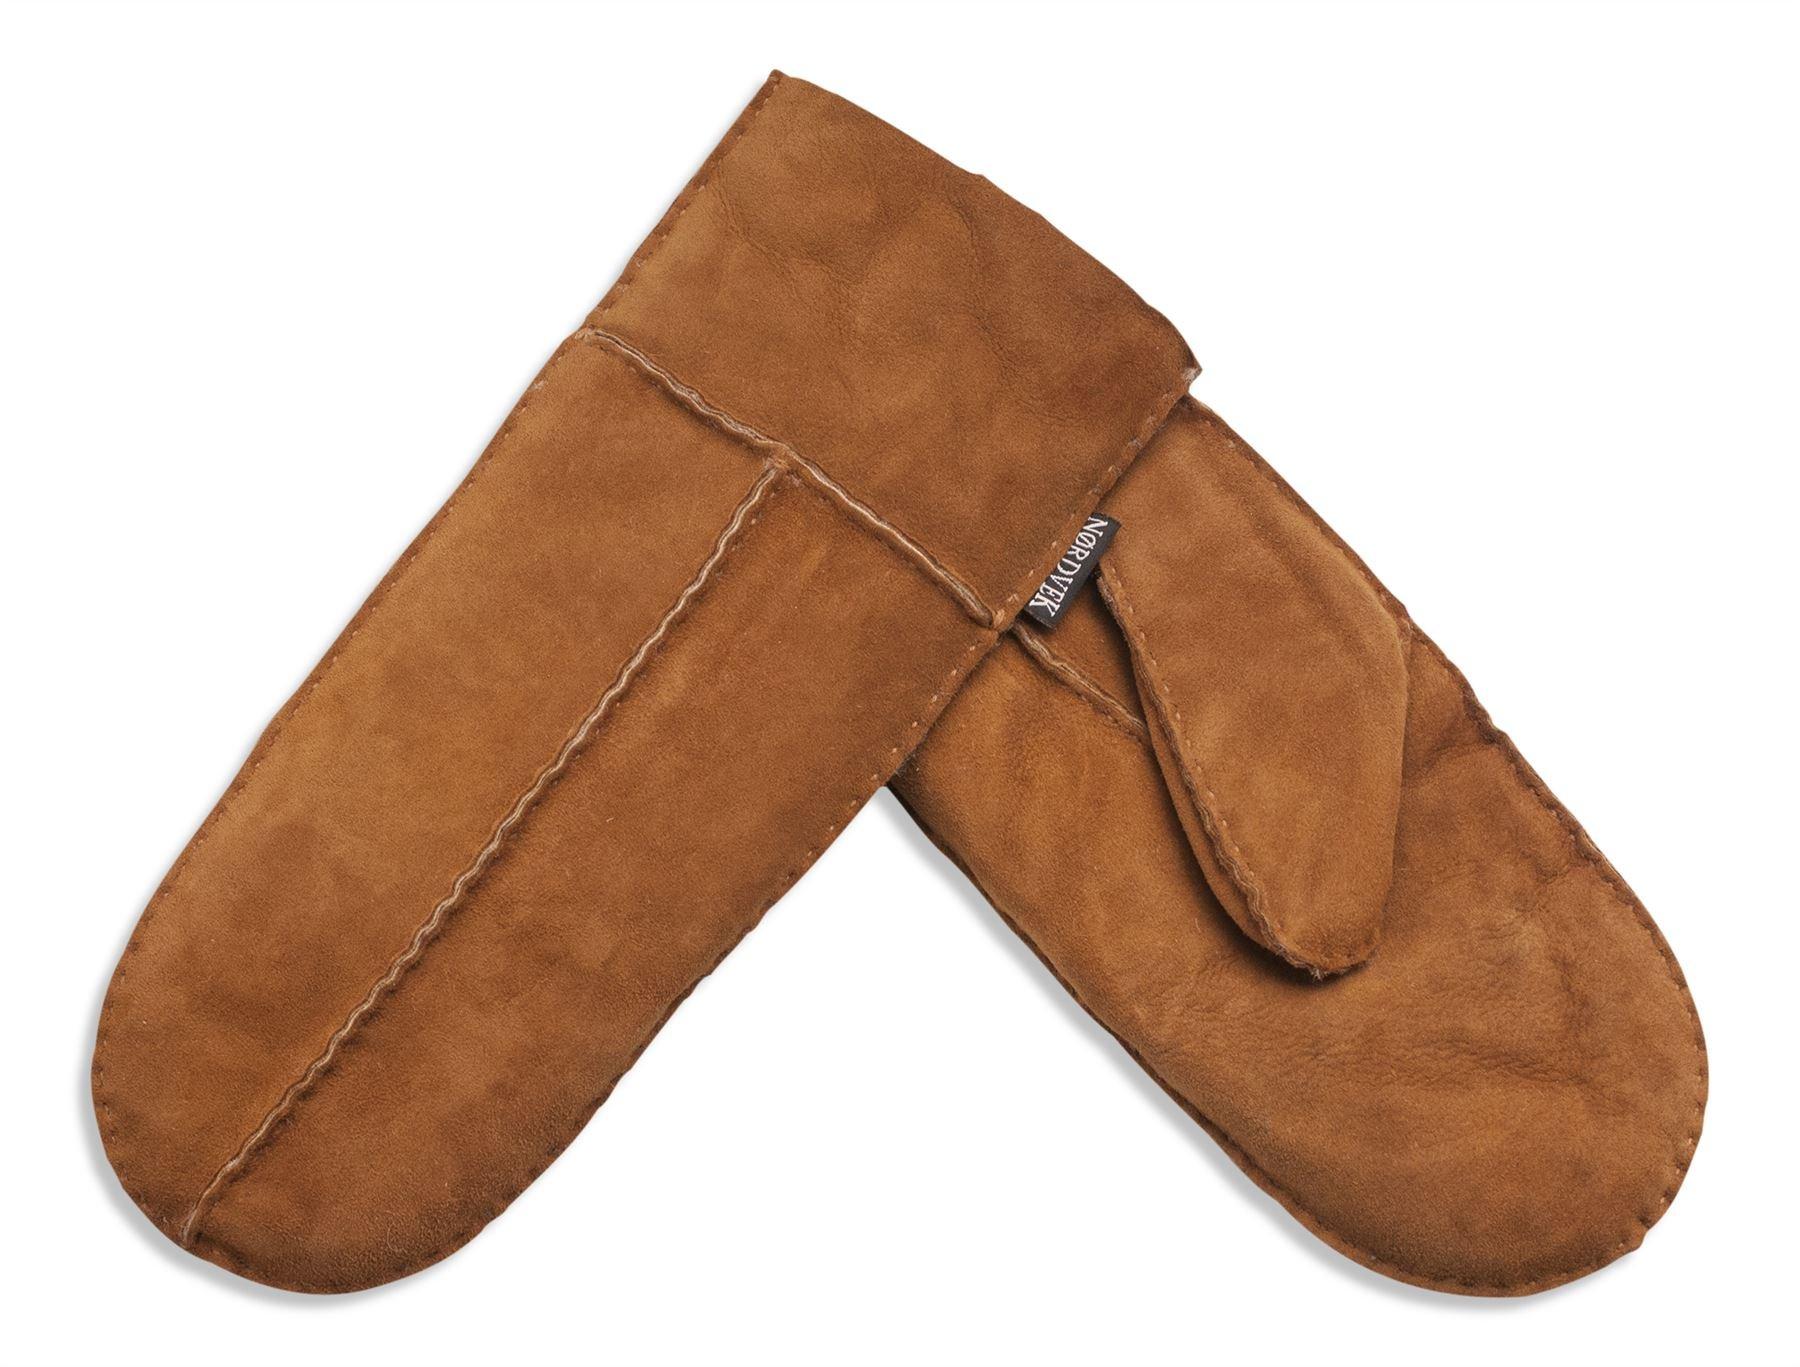 Nordvek Women's Sheepskin Mittens # 315-100 (One Size, Light Brown) by Nordvek